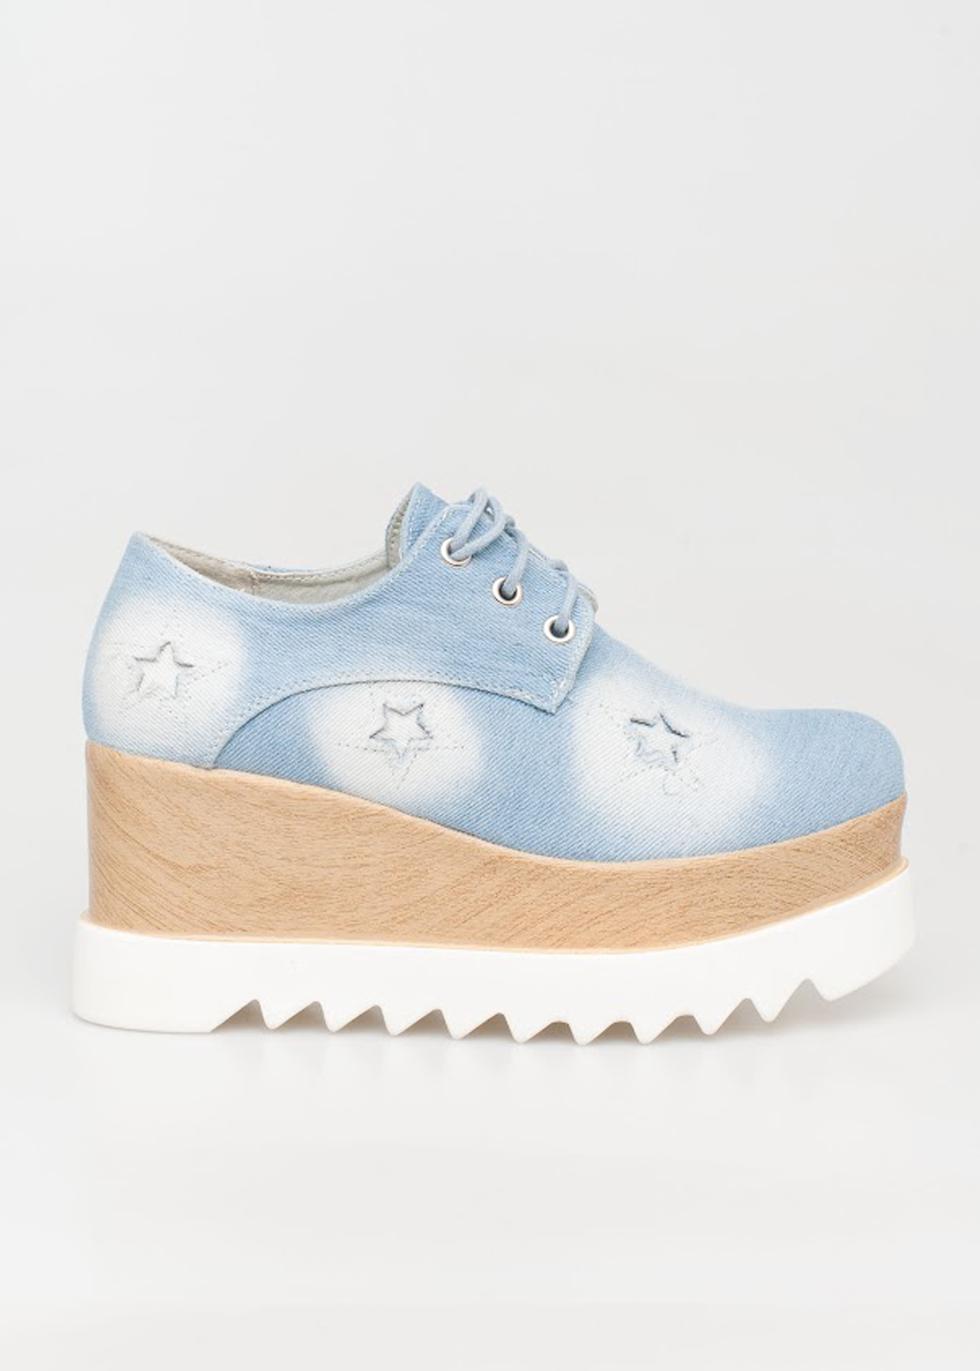 Clara flatform, jean (light) παπούτσια